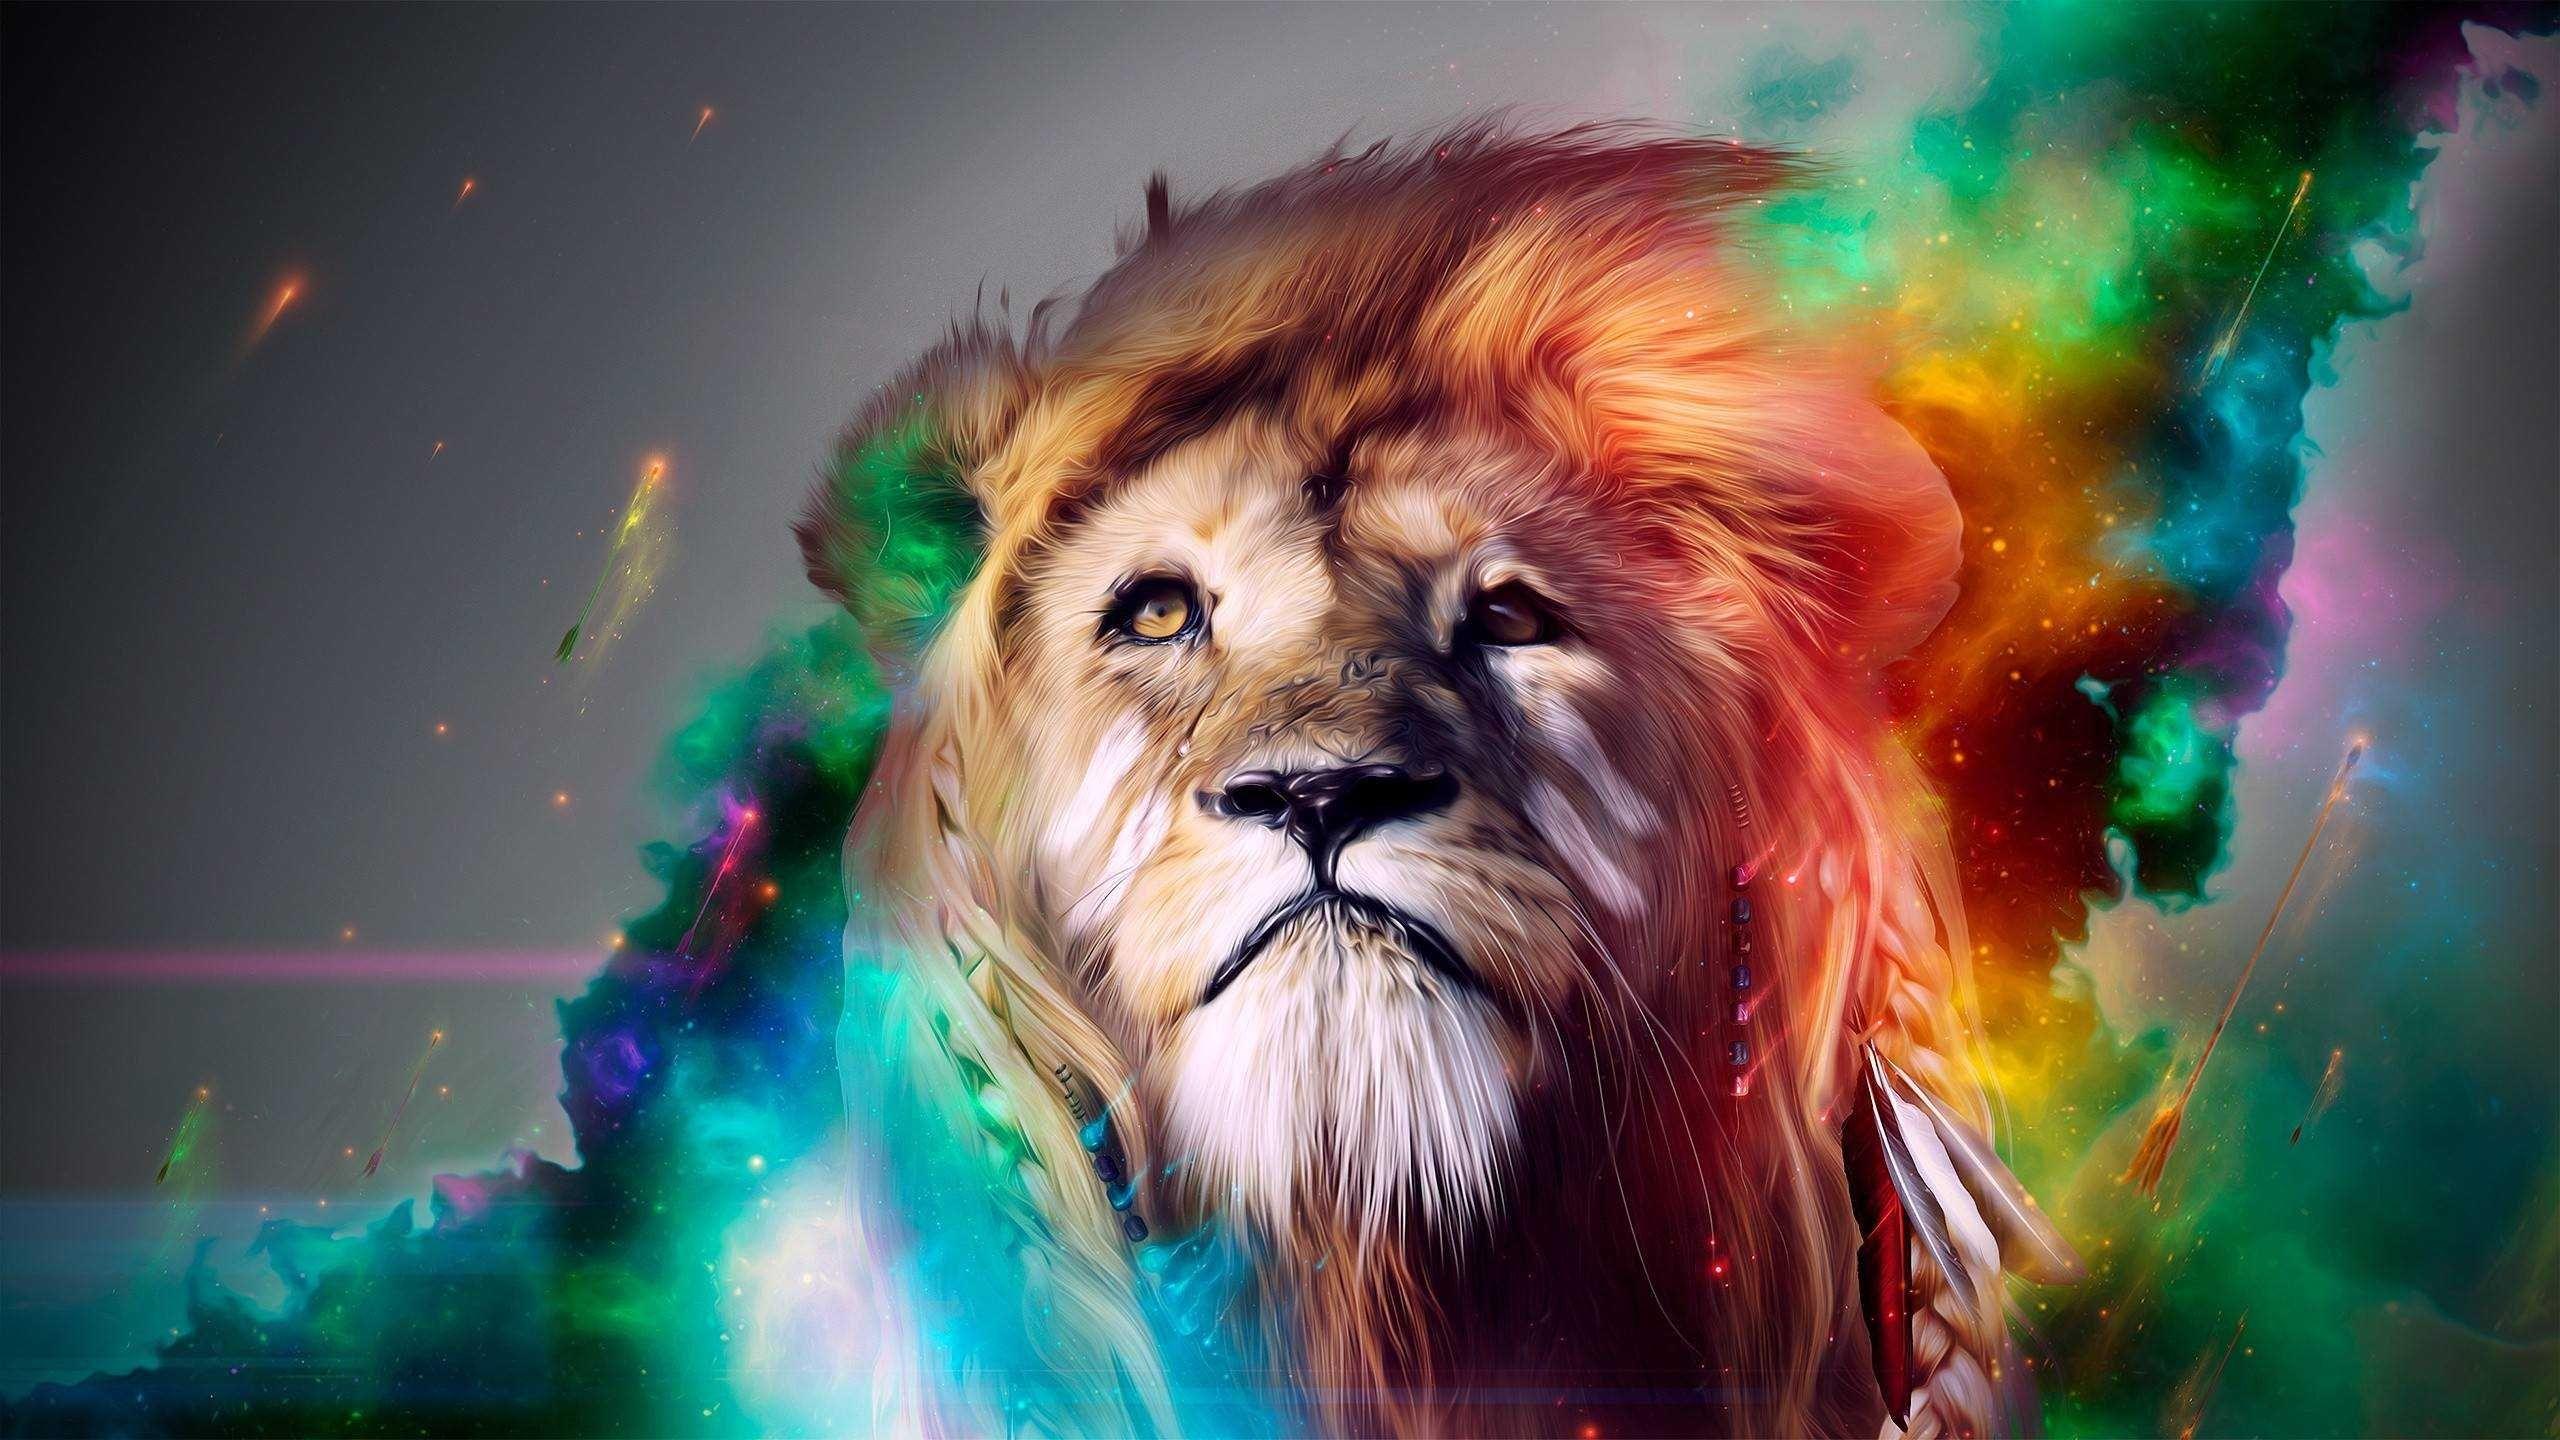 Lion 3d Hq Picture Wallpaper Animals Hd Wallpaper Lion Wallpaper